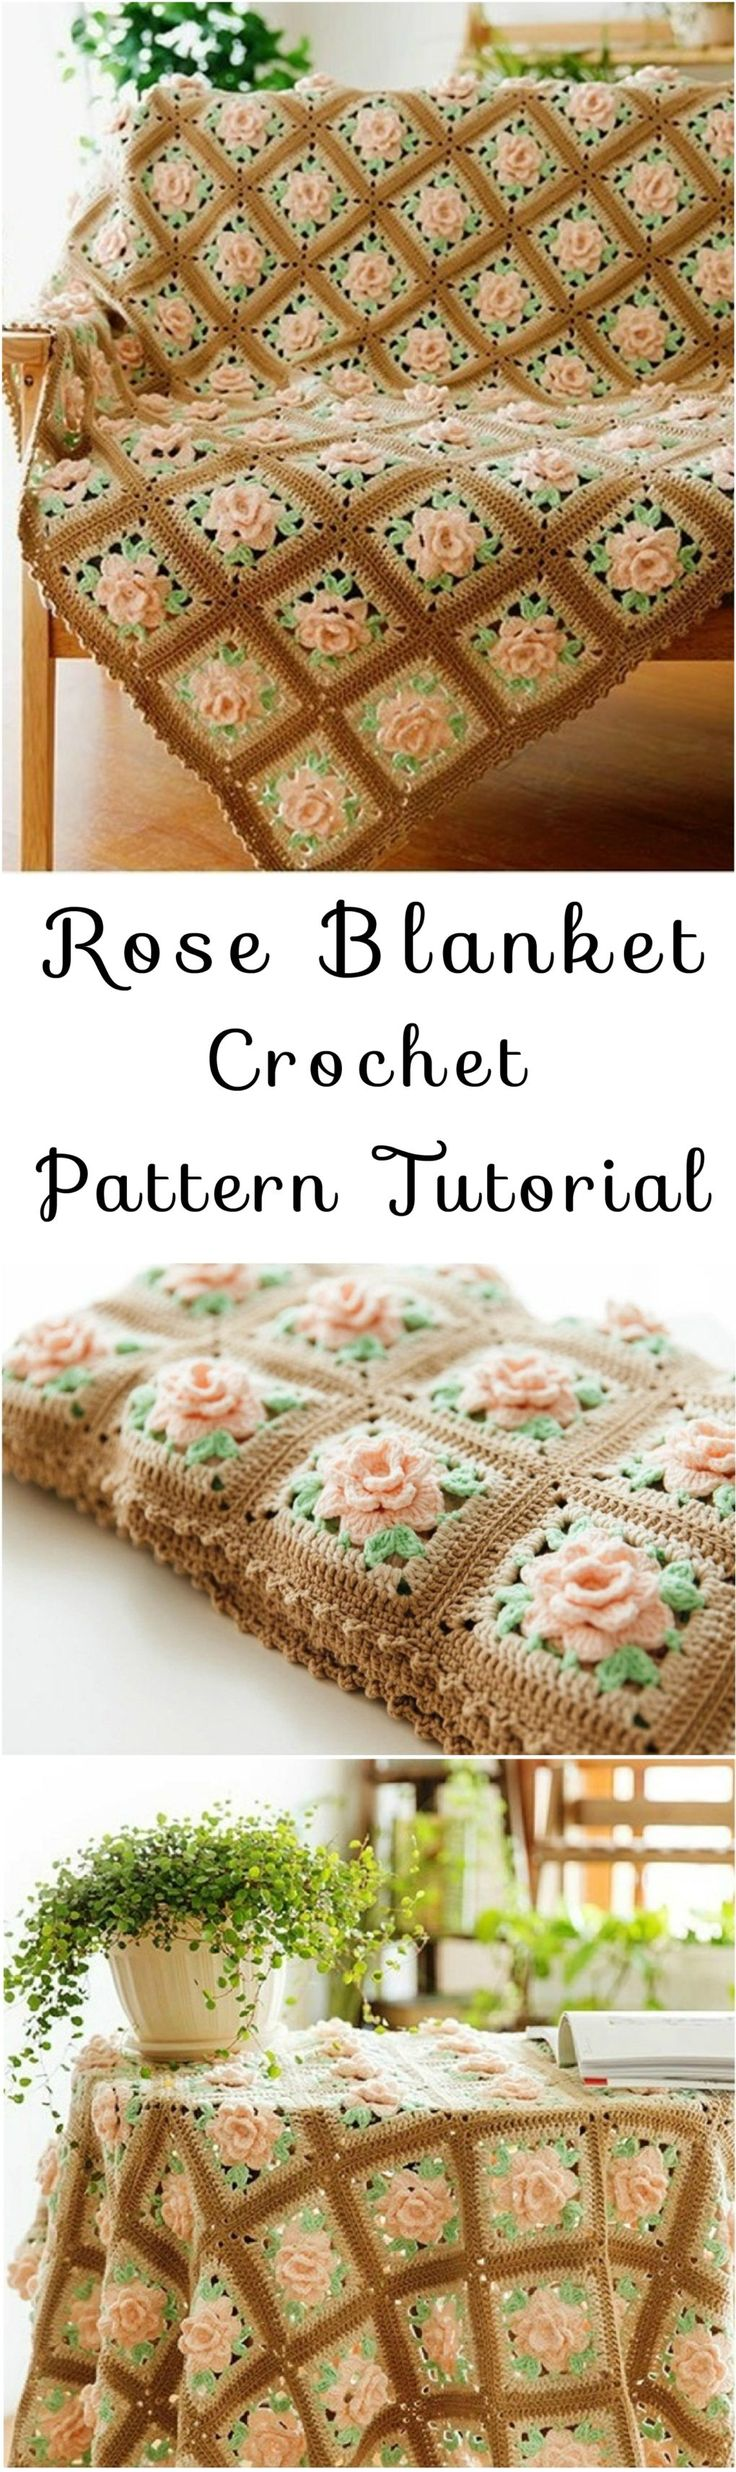 Rose Blanket Crochet Pattern Tutorial.  Consider using black instead of the brown.